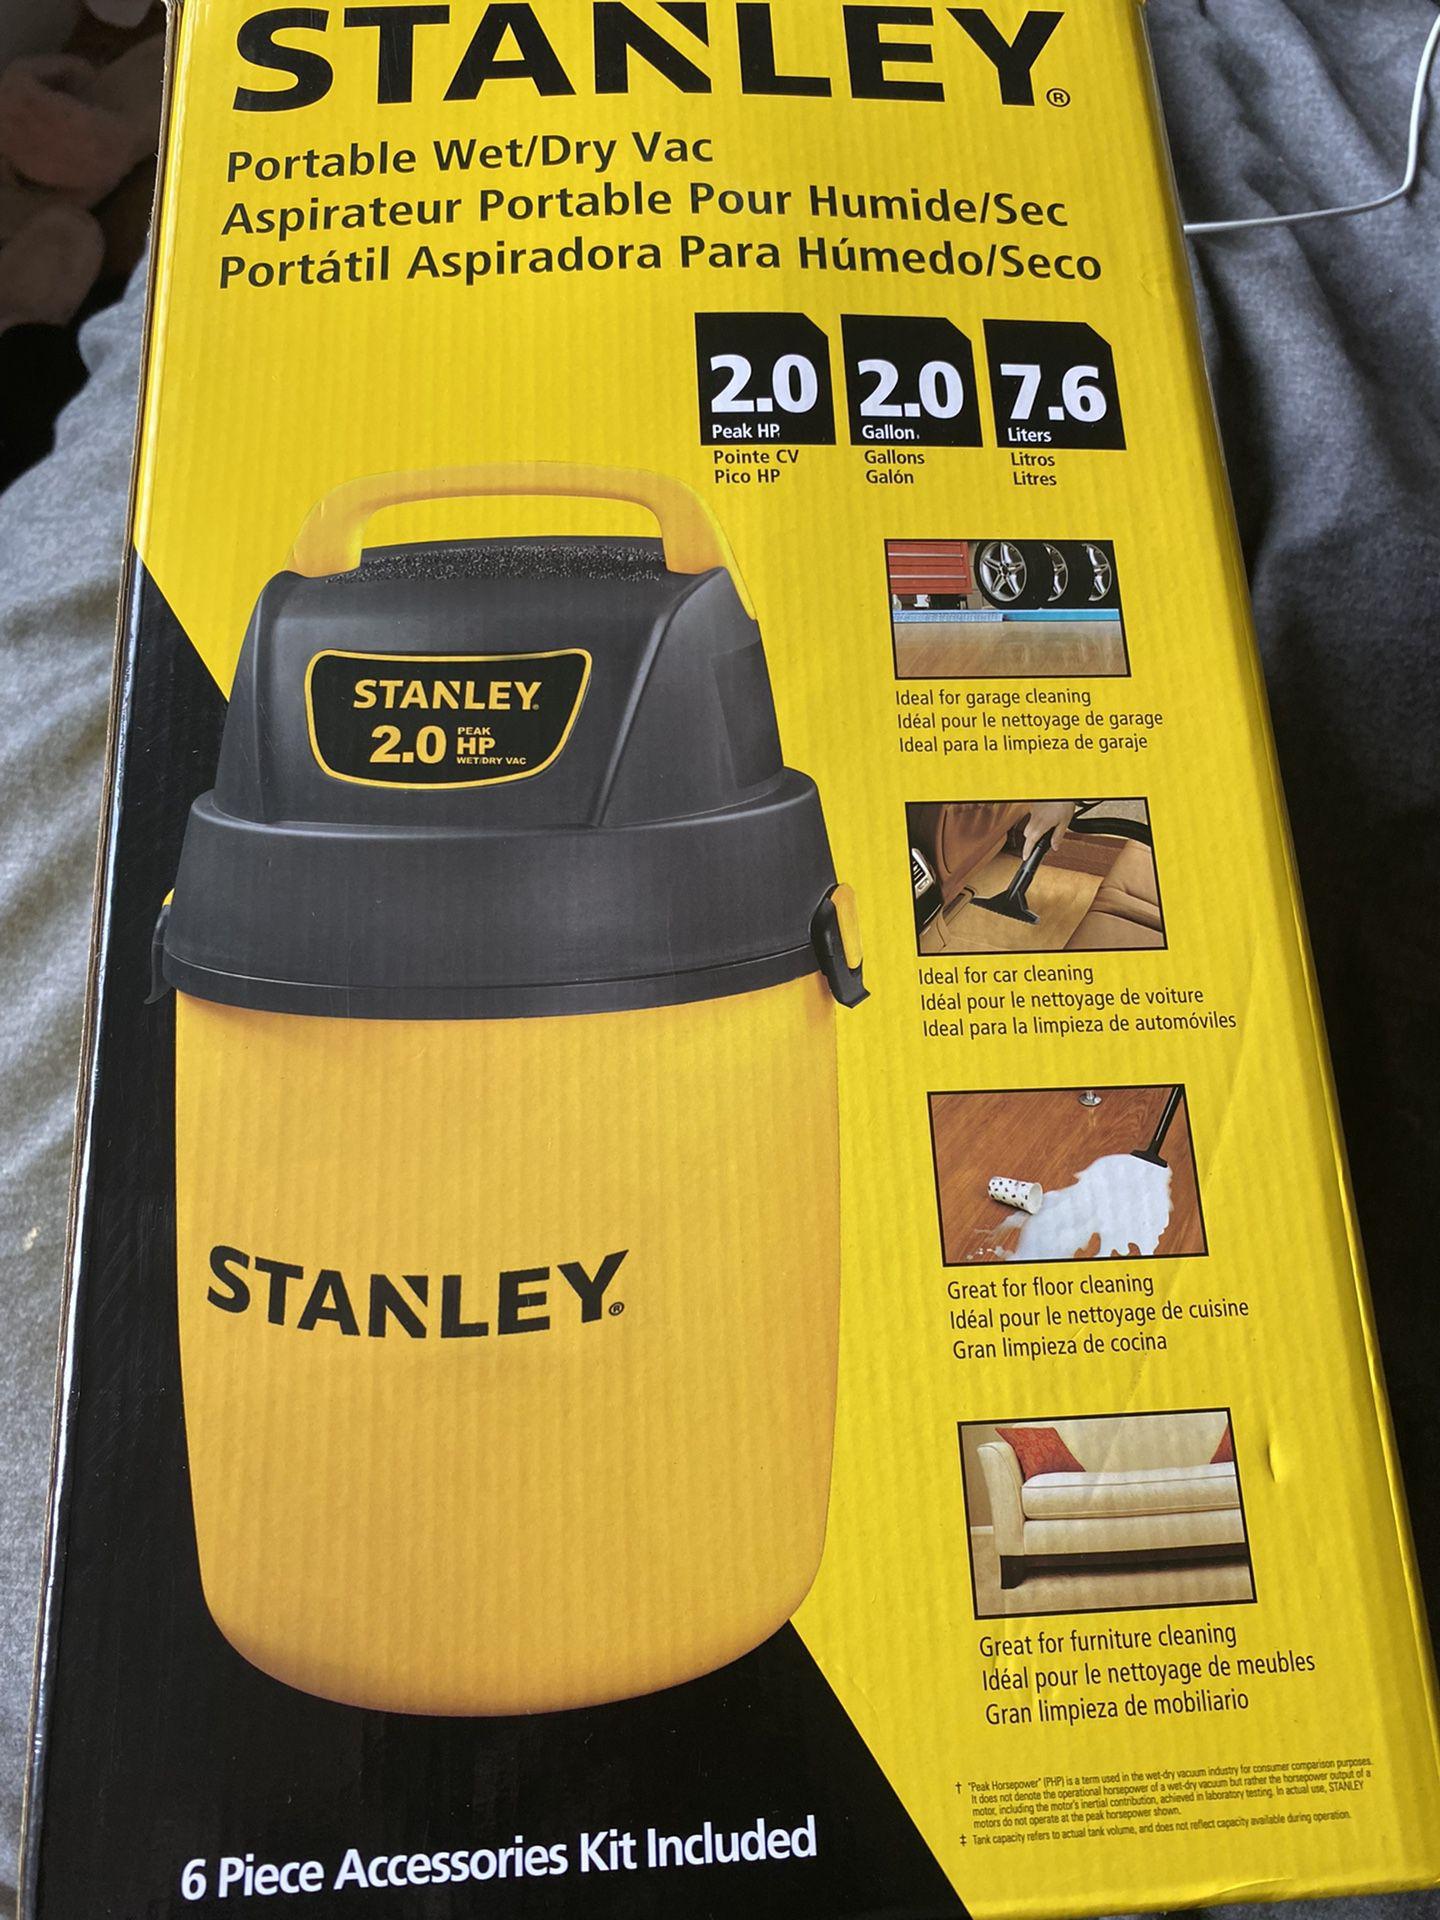 Stanley 2.0 Wet/Dry Vacuum